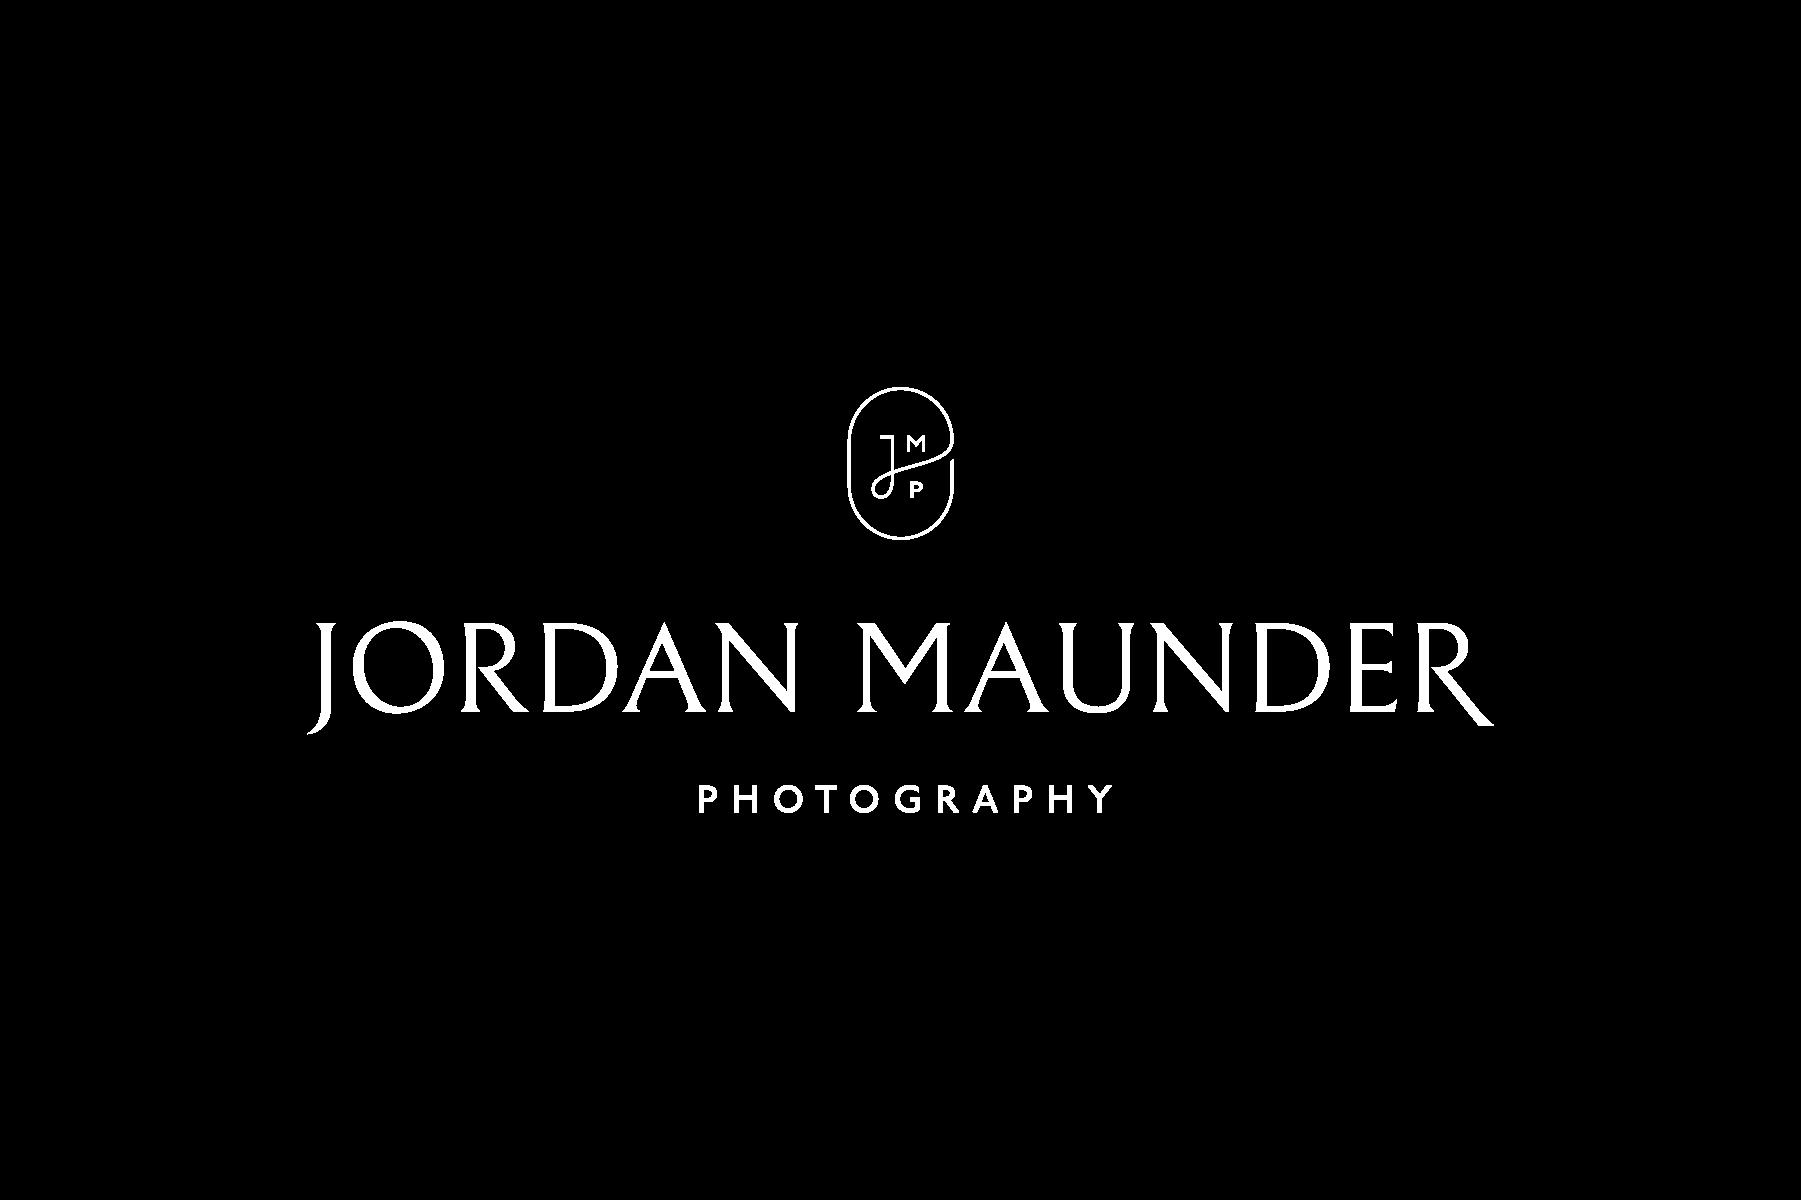 Jordan Maunder